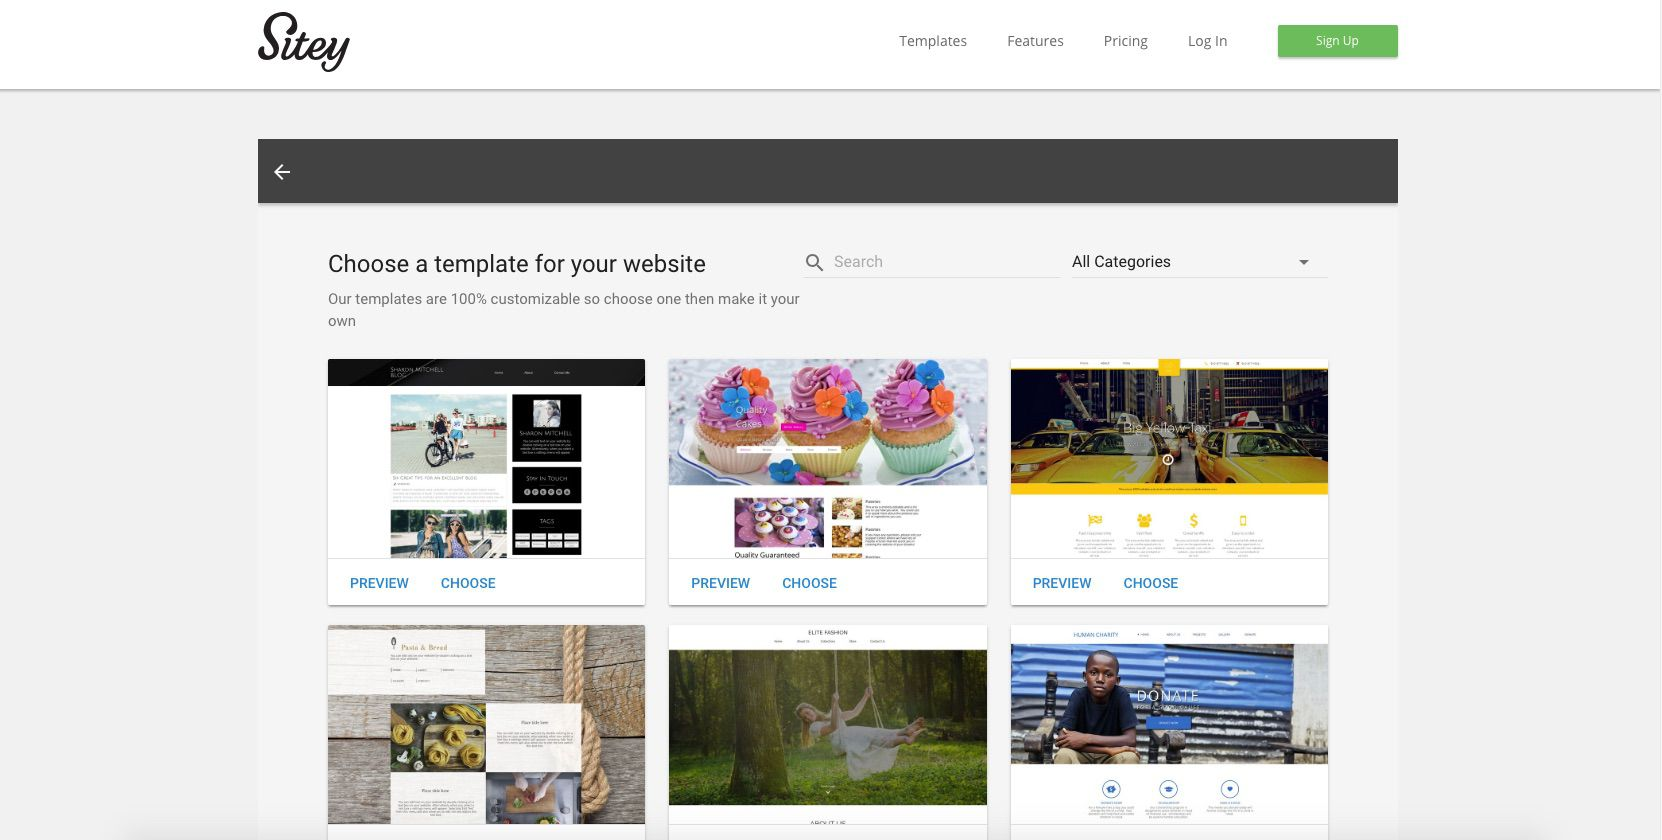 A screenshot of Sitey.com.